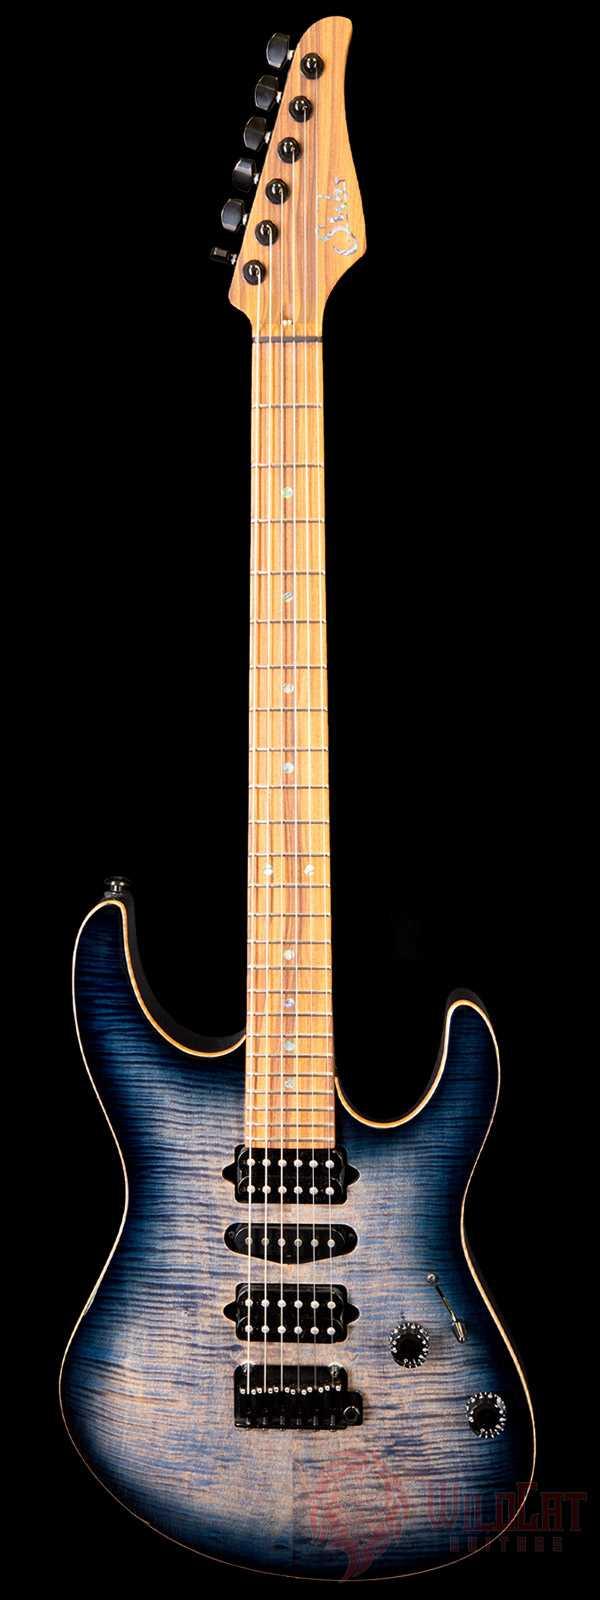 Suhr Custom Modern Faded Trans Whale Blue Pau Ferro Neck